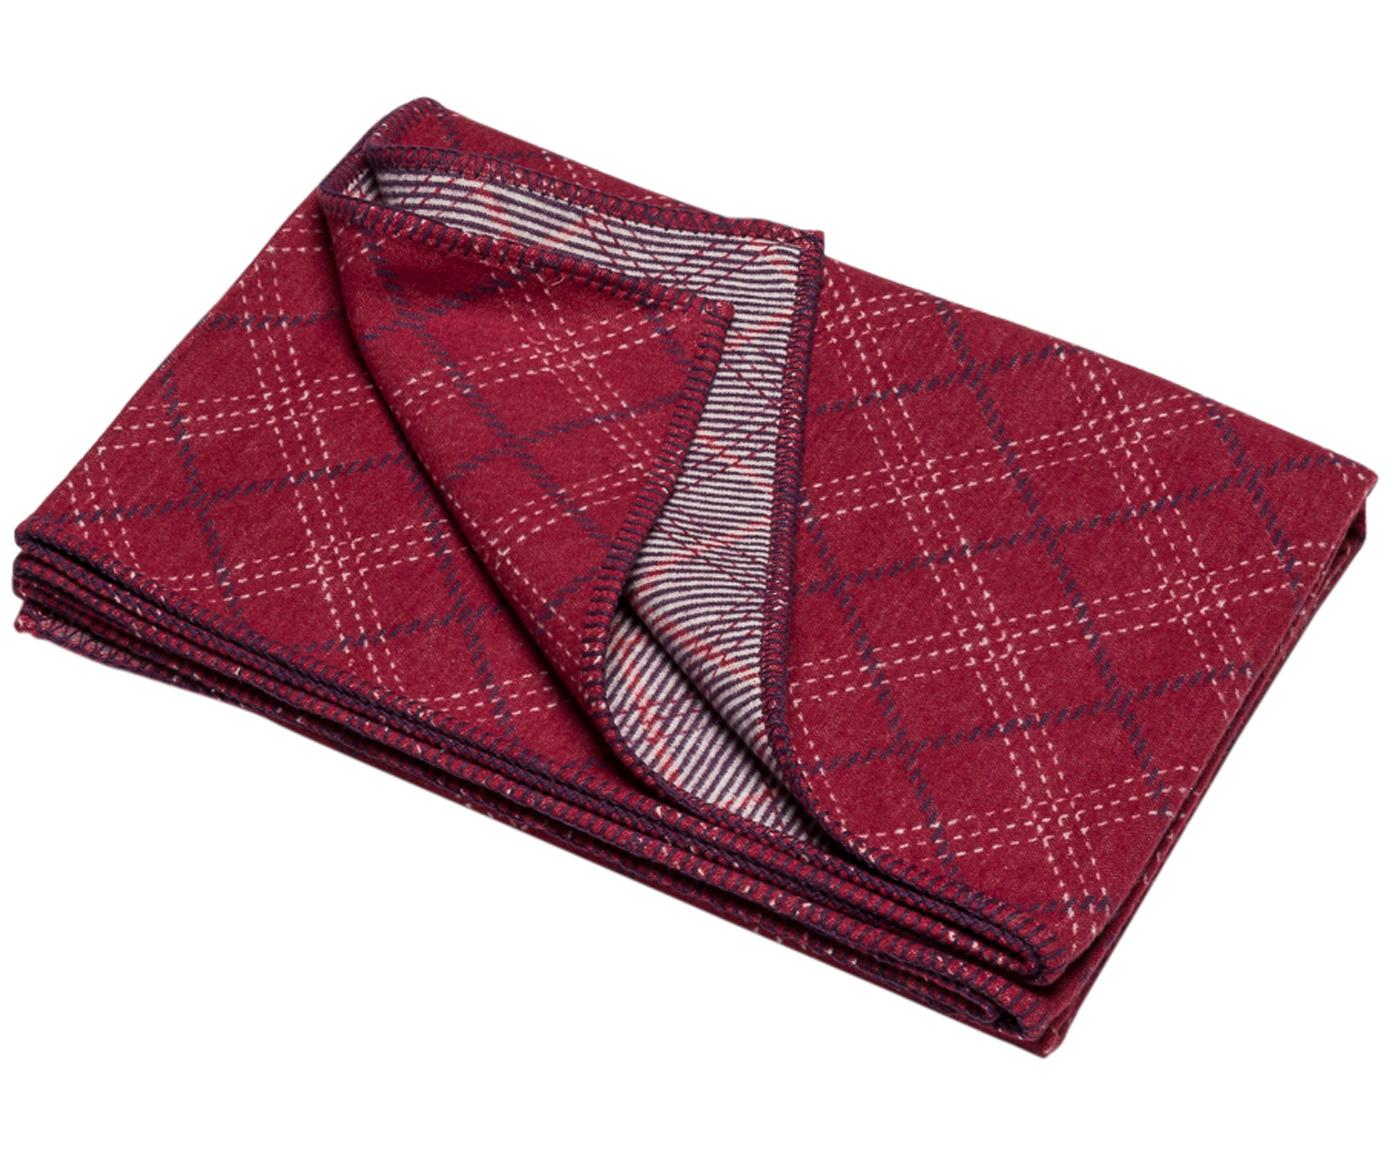 Manta Karol, Tapizado: 85%algodón, 8%viscosa, , Rojo, blanco, gris oscuro, An 140 x L 200 cm